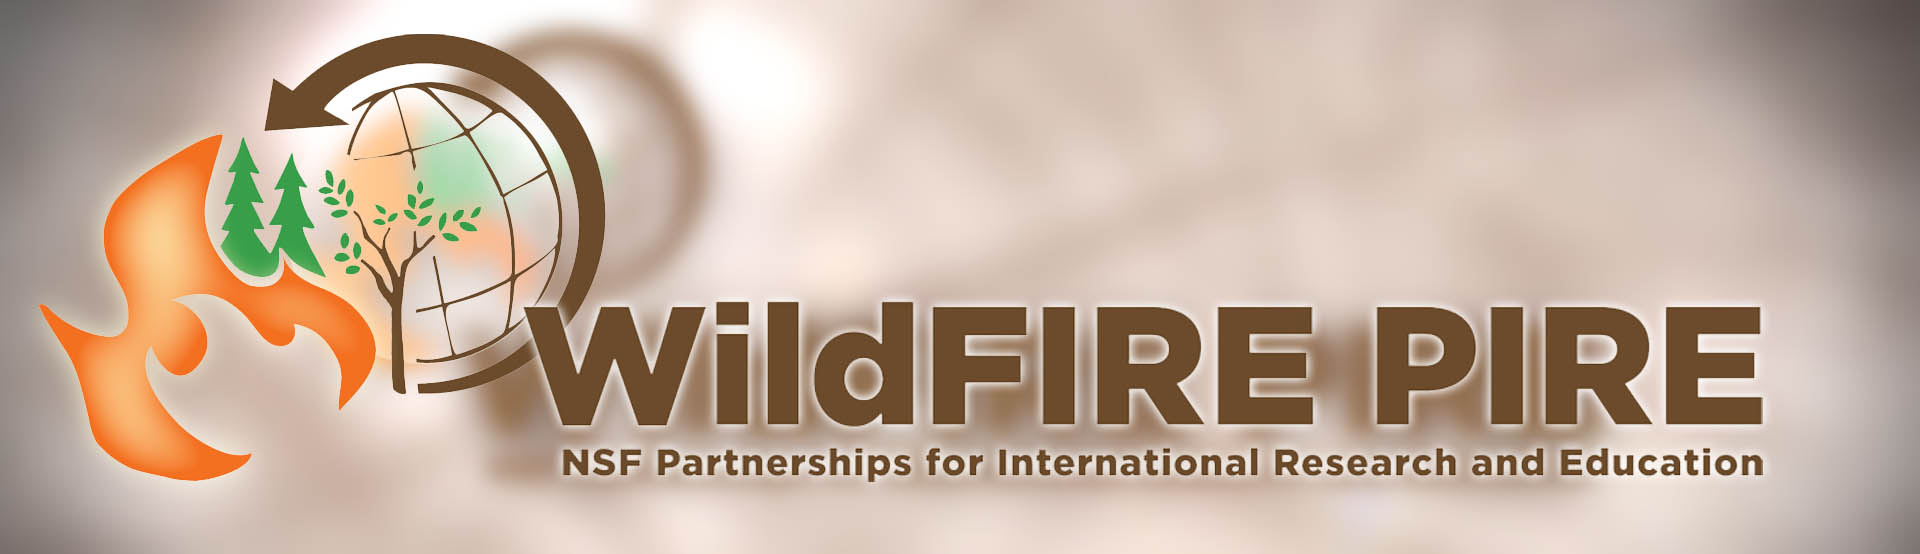 WildFIRE PIRE